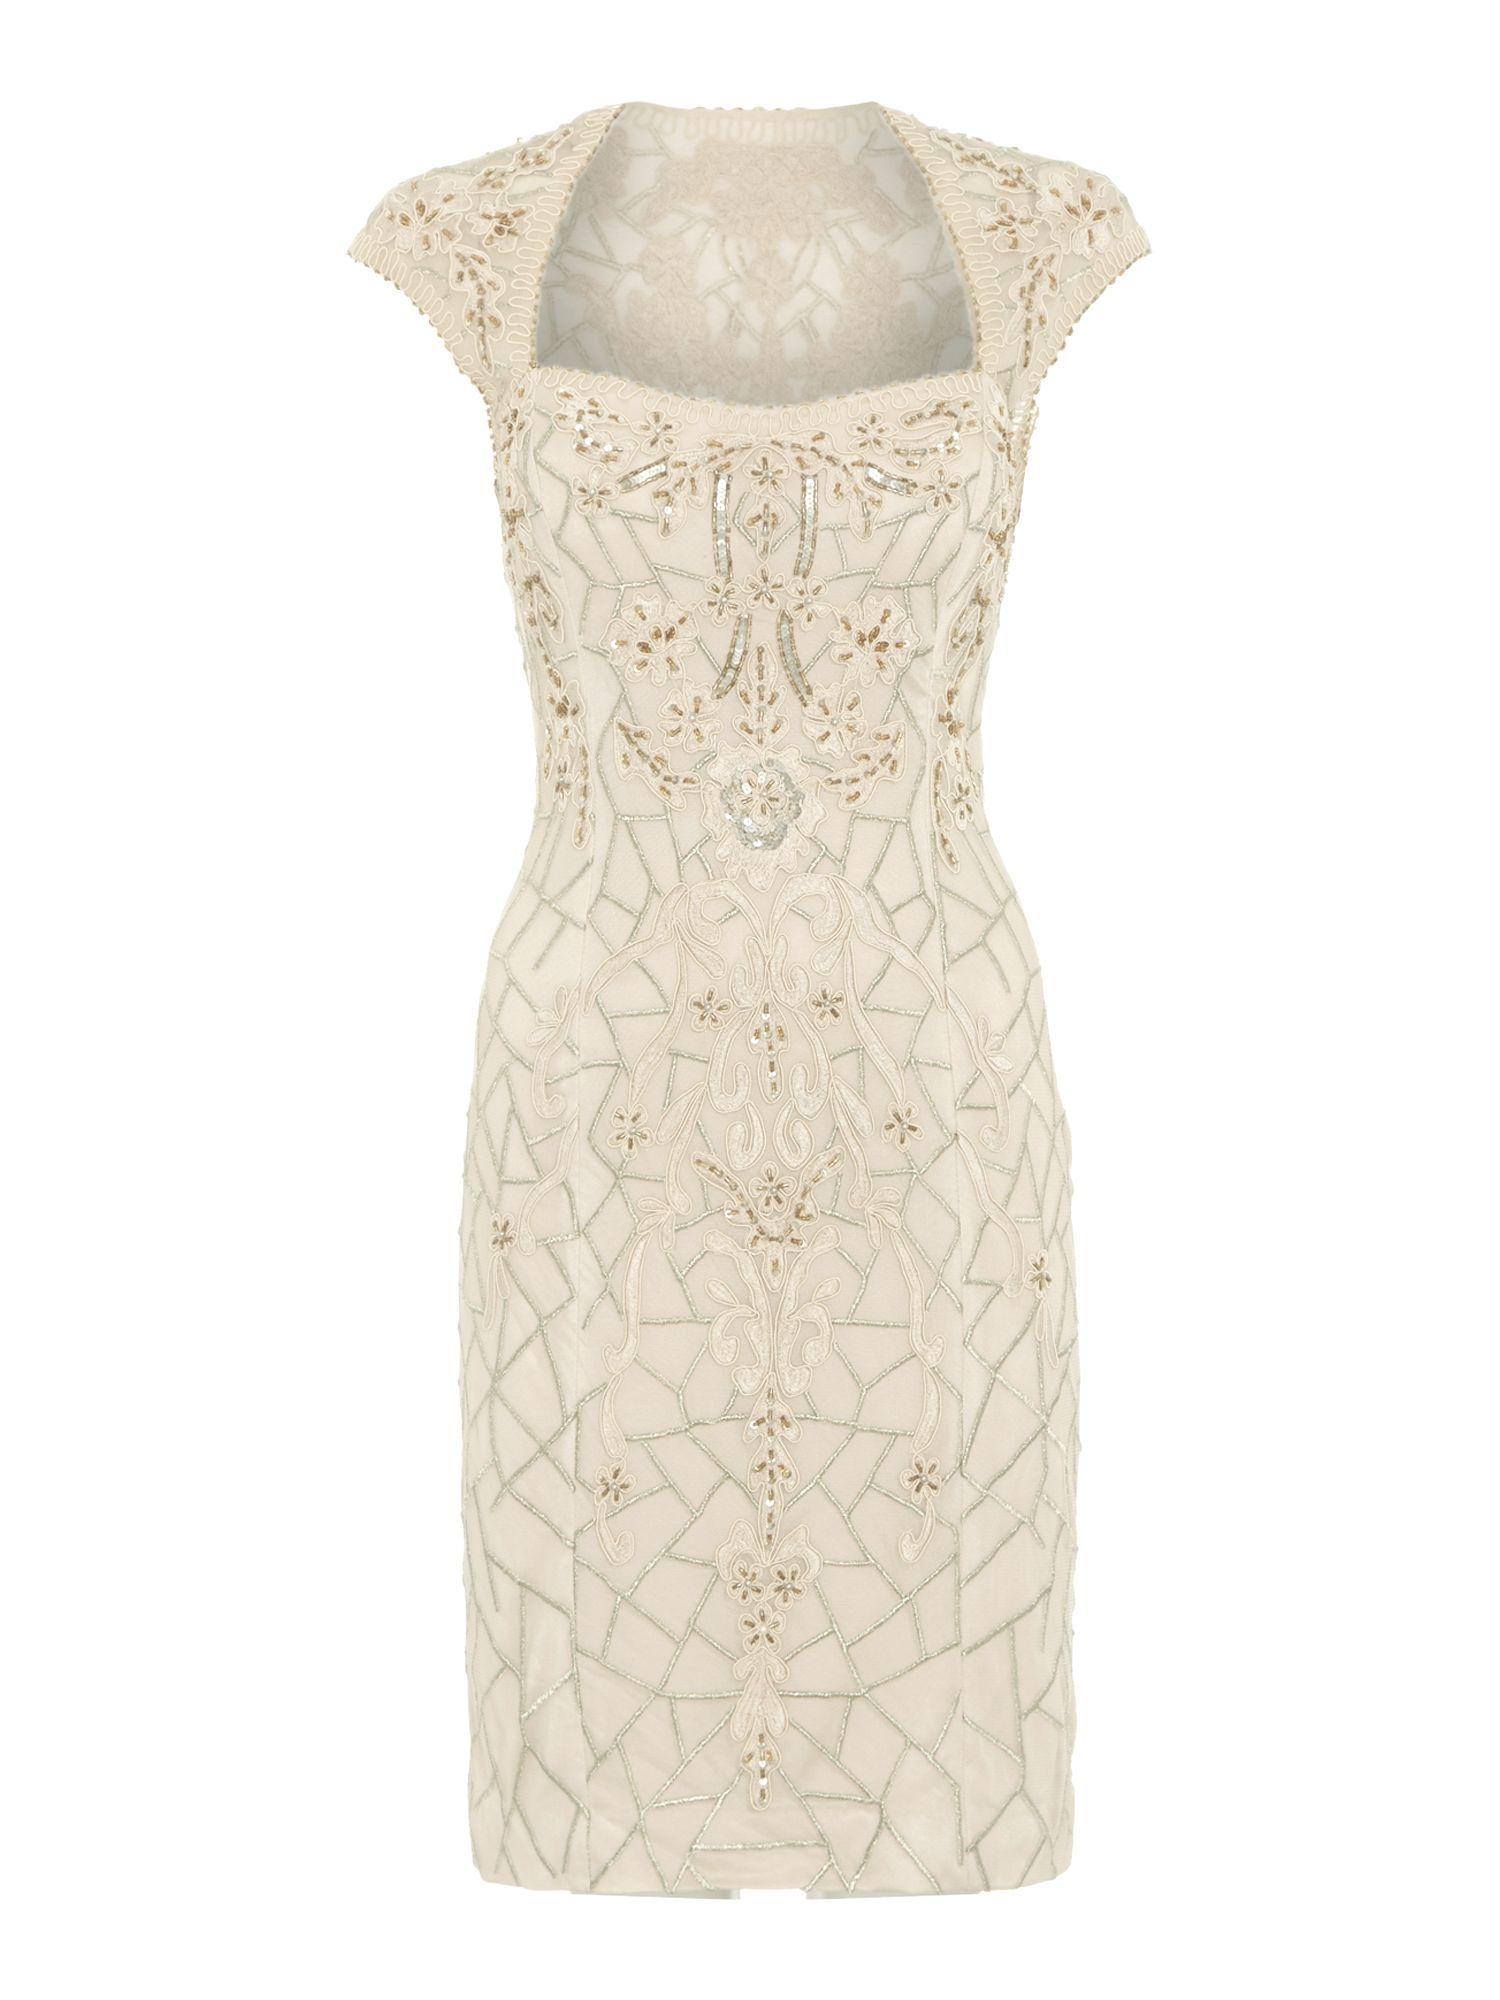 1920s Dresses Uk Flapper Gatsby Downton Abbey Dress 1920s Fashion Dresses 1920s Fashion 1920s Dress